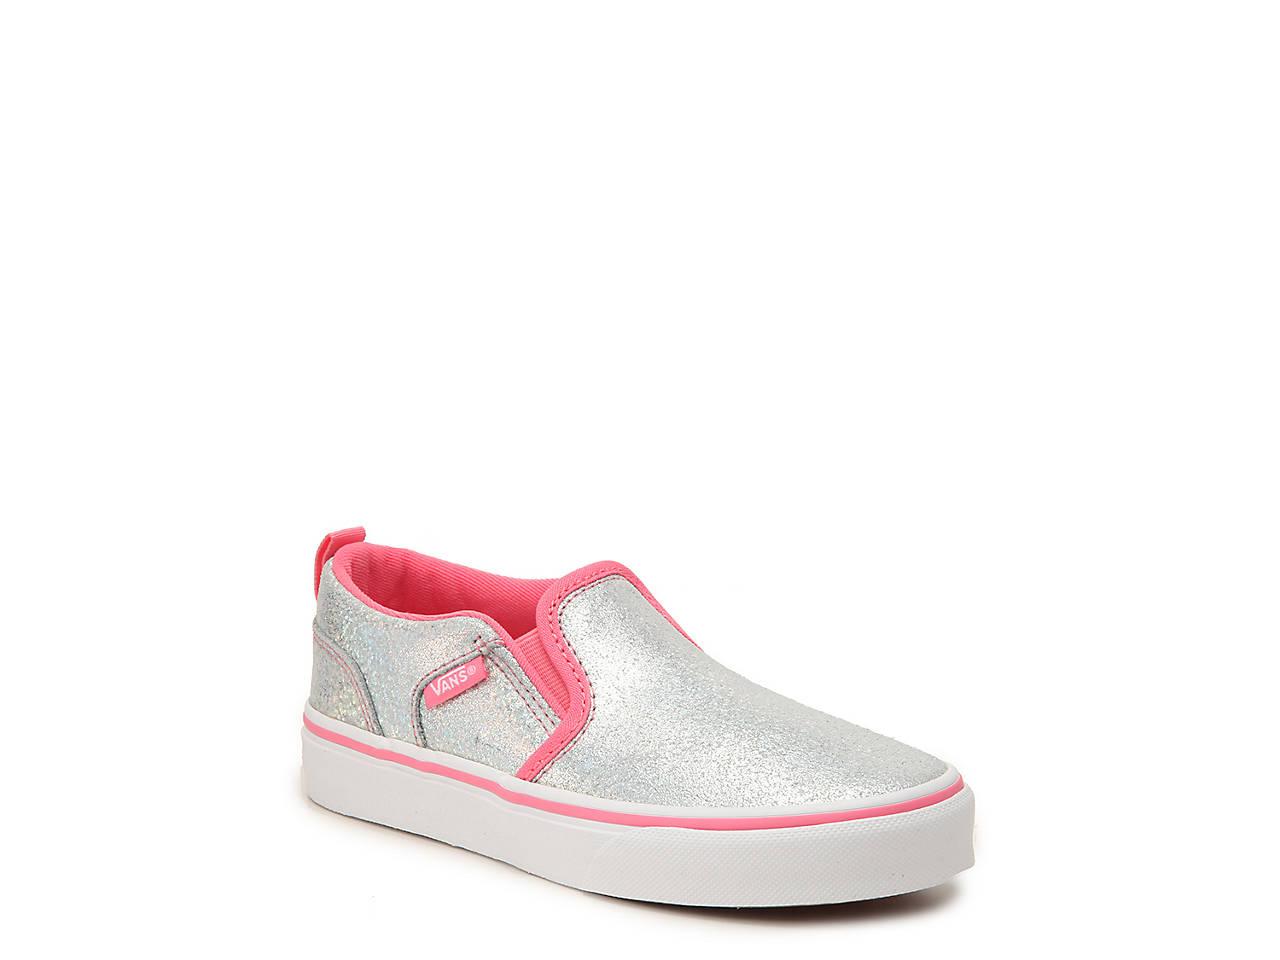 e28447ad87 Vans Asher Toddler   Youth Slip-On Sneaker Kids Shoes